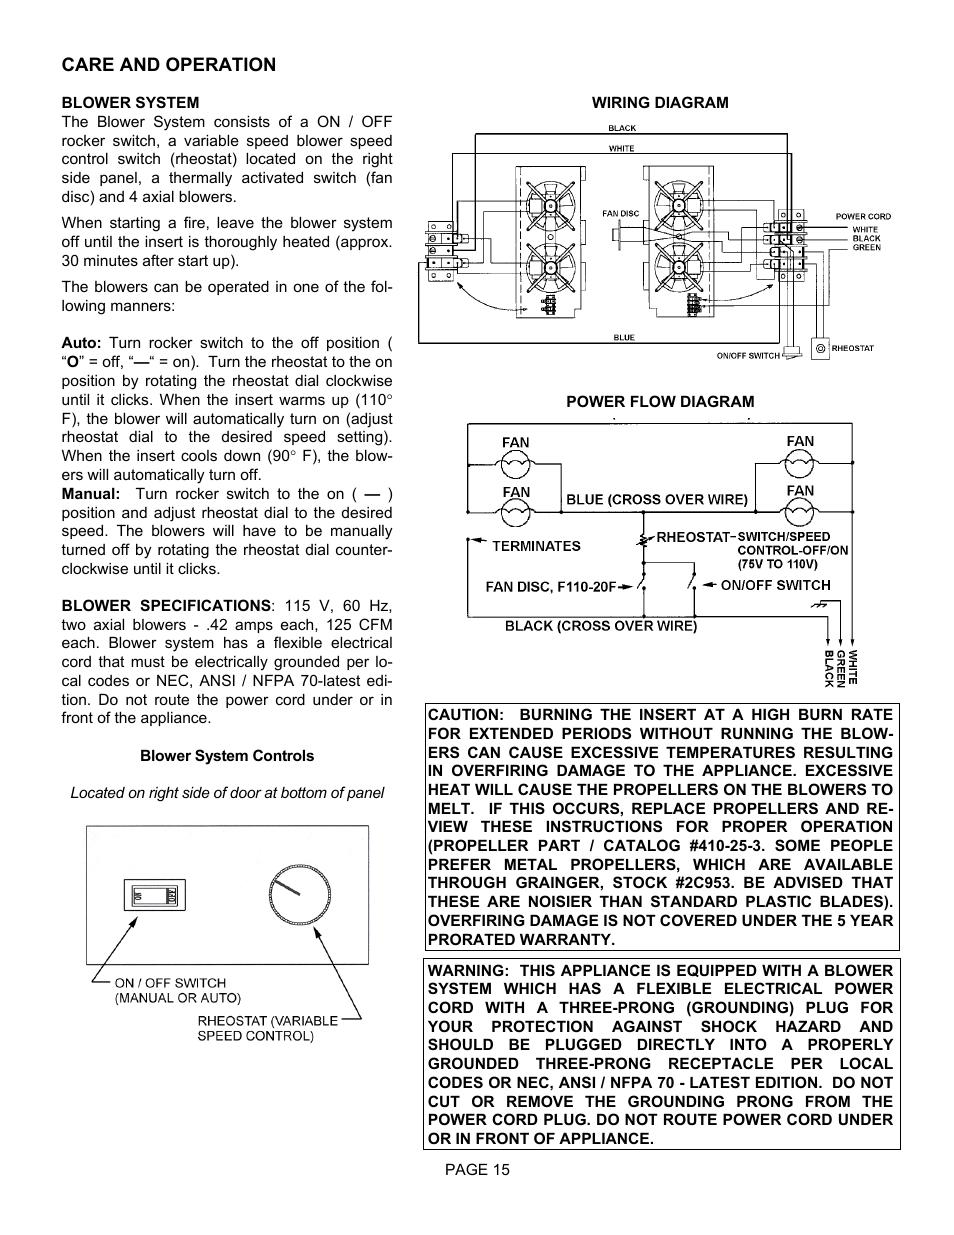 hight resolution of 110 wiring diagram fan switch reostat